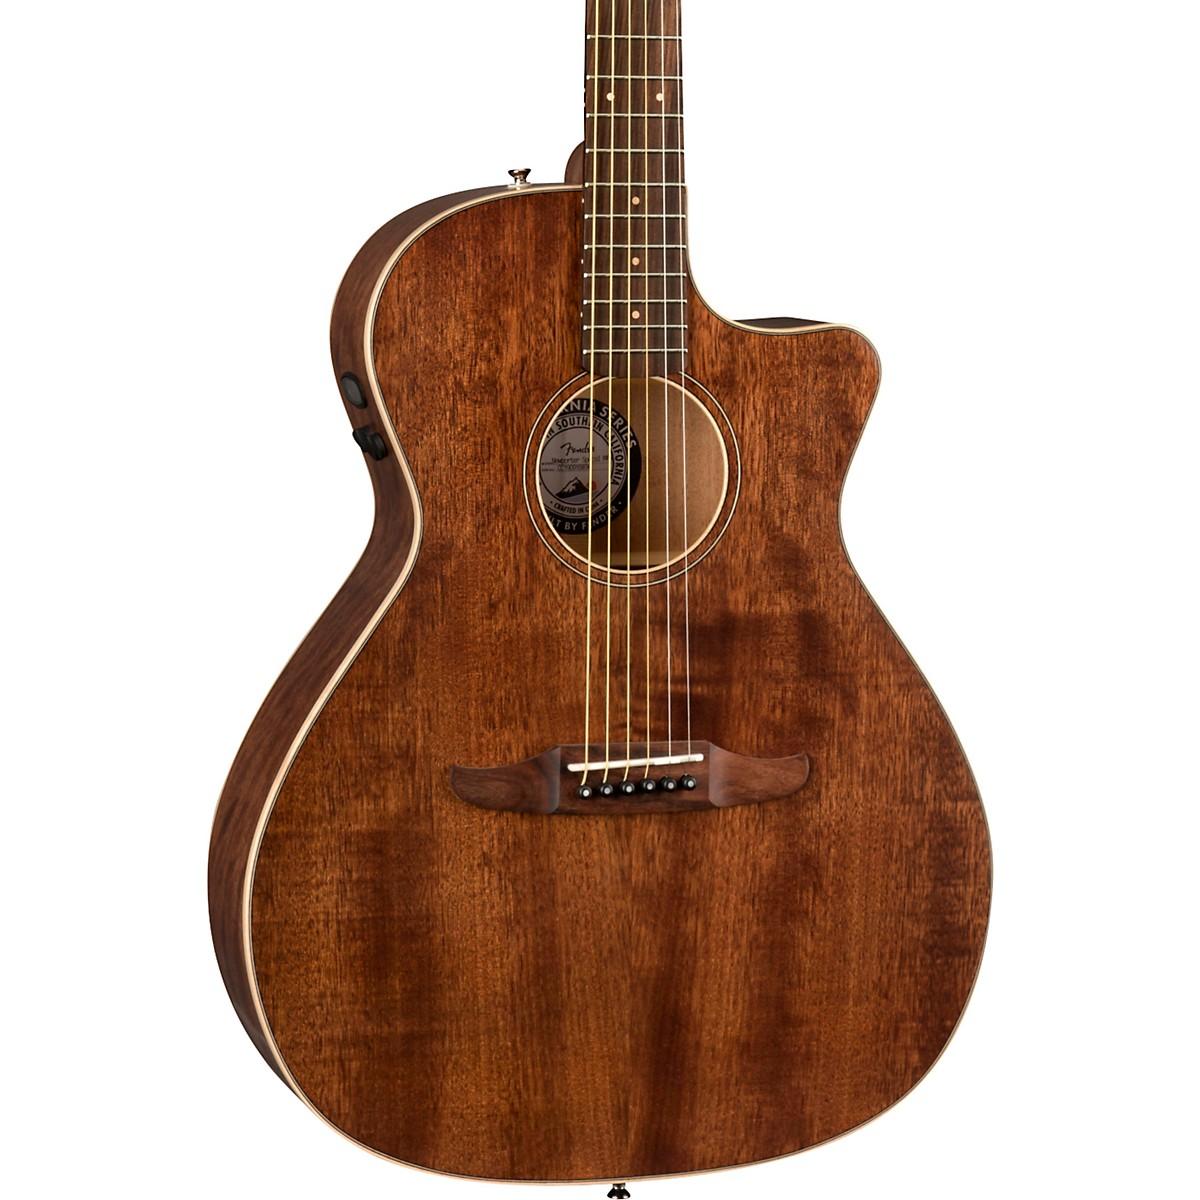 Fender California Newporter Special Pau Ferro Fingerboard Acoustic-Electric Guitar